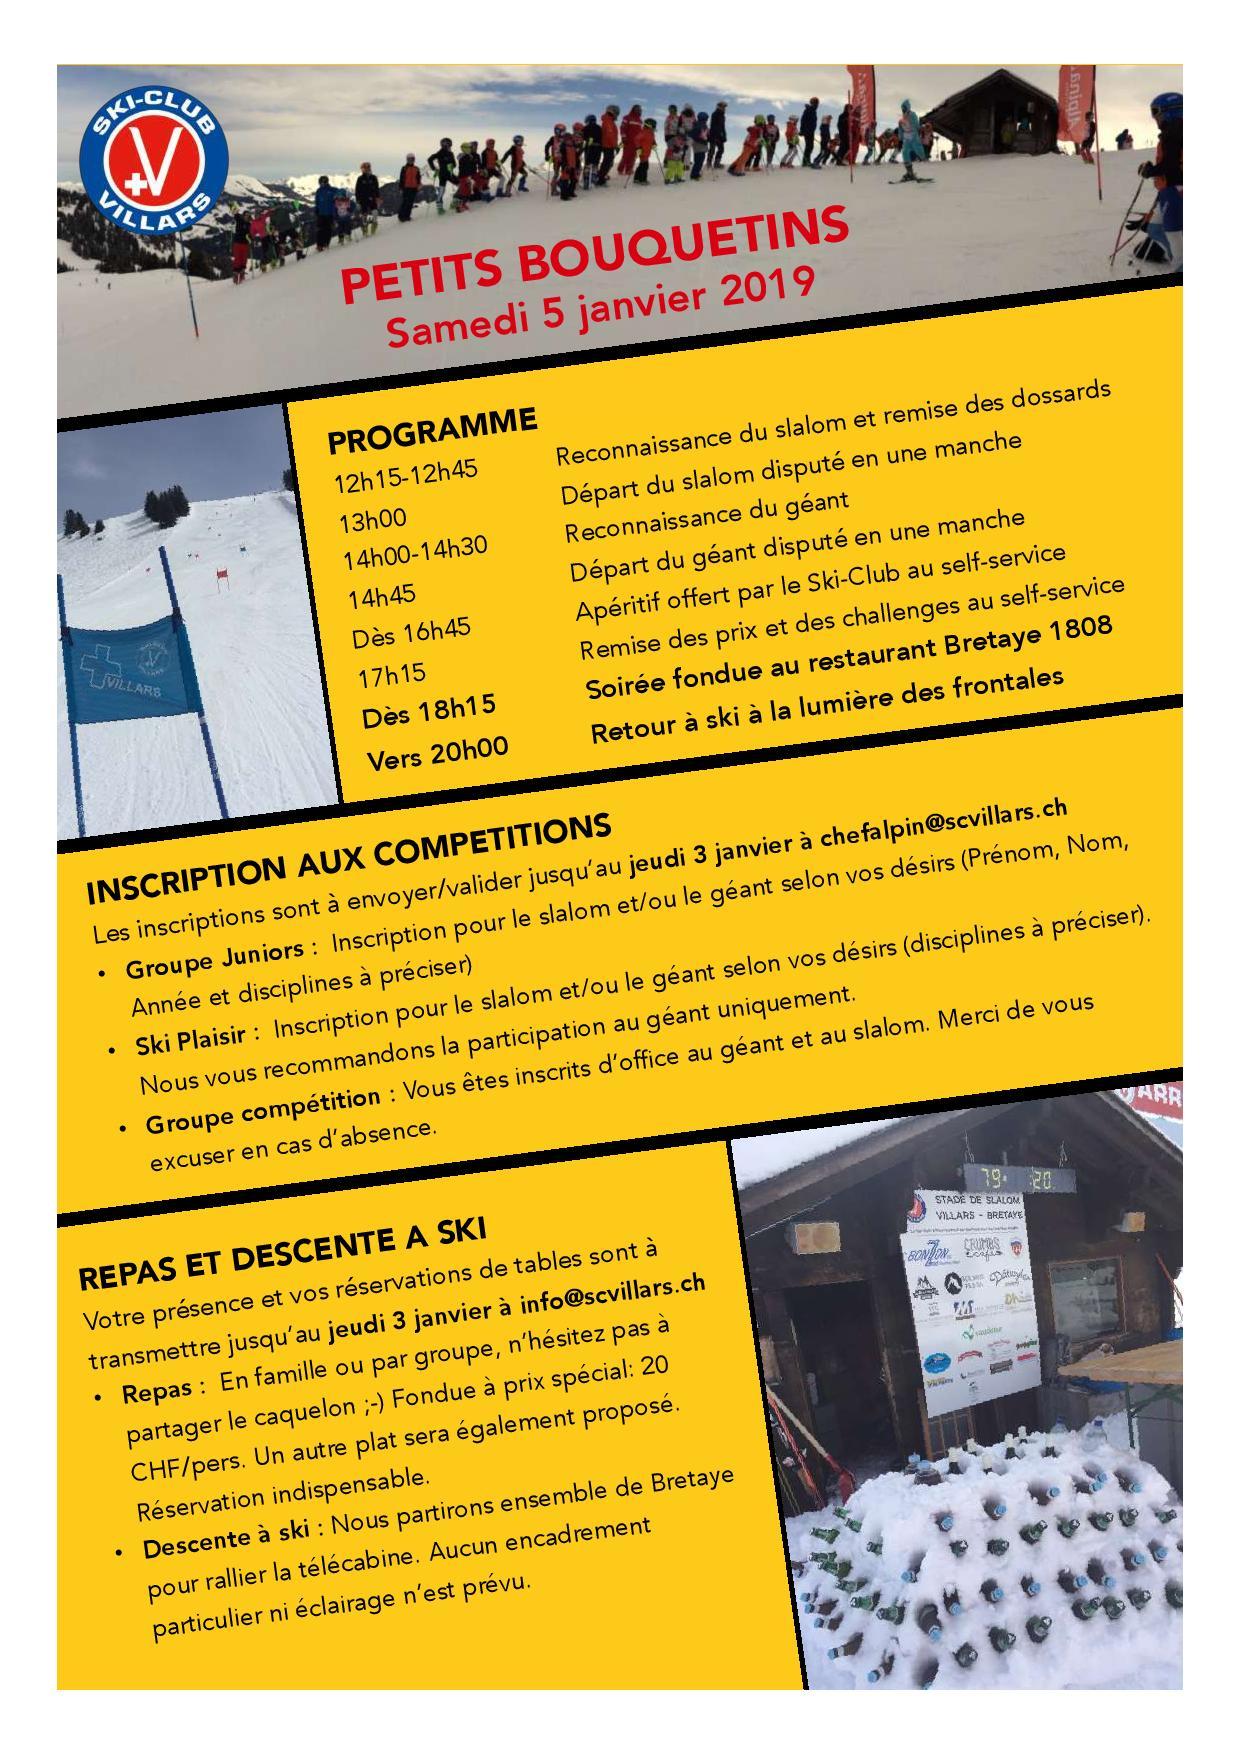 Petits Bouquetins - Programme 2.jpg